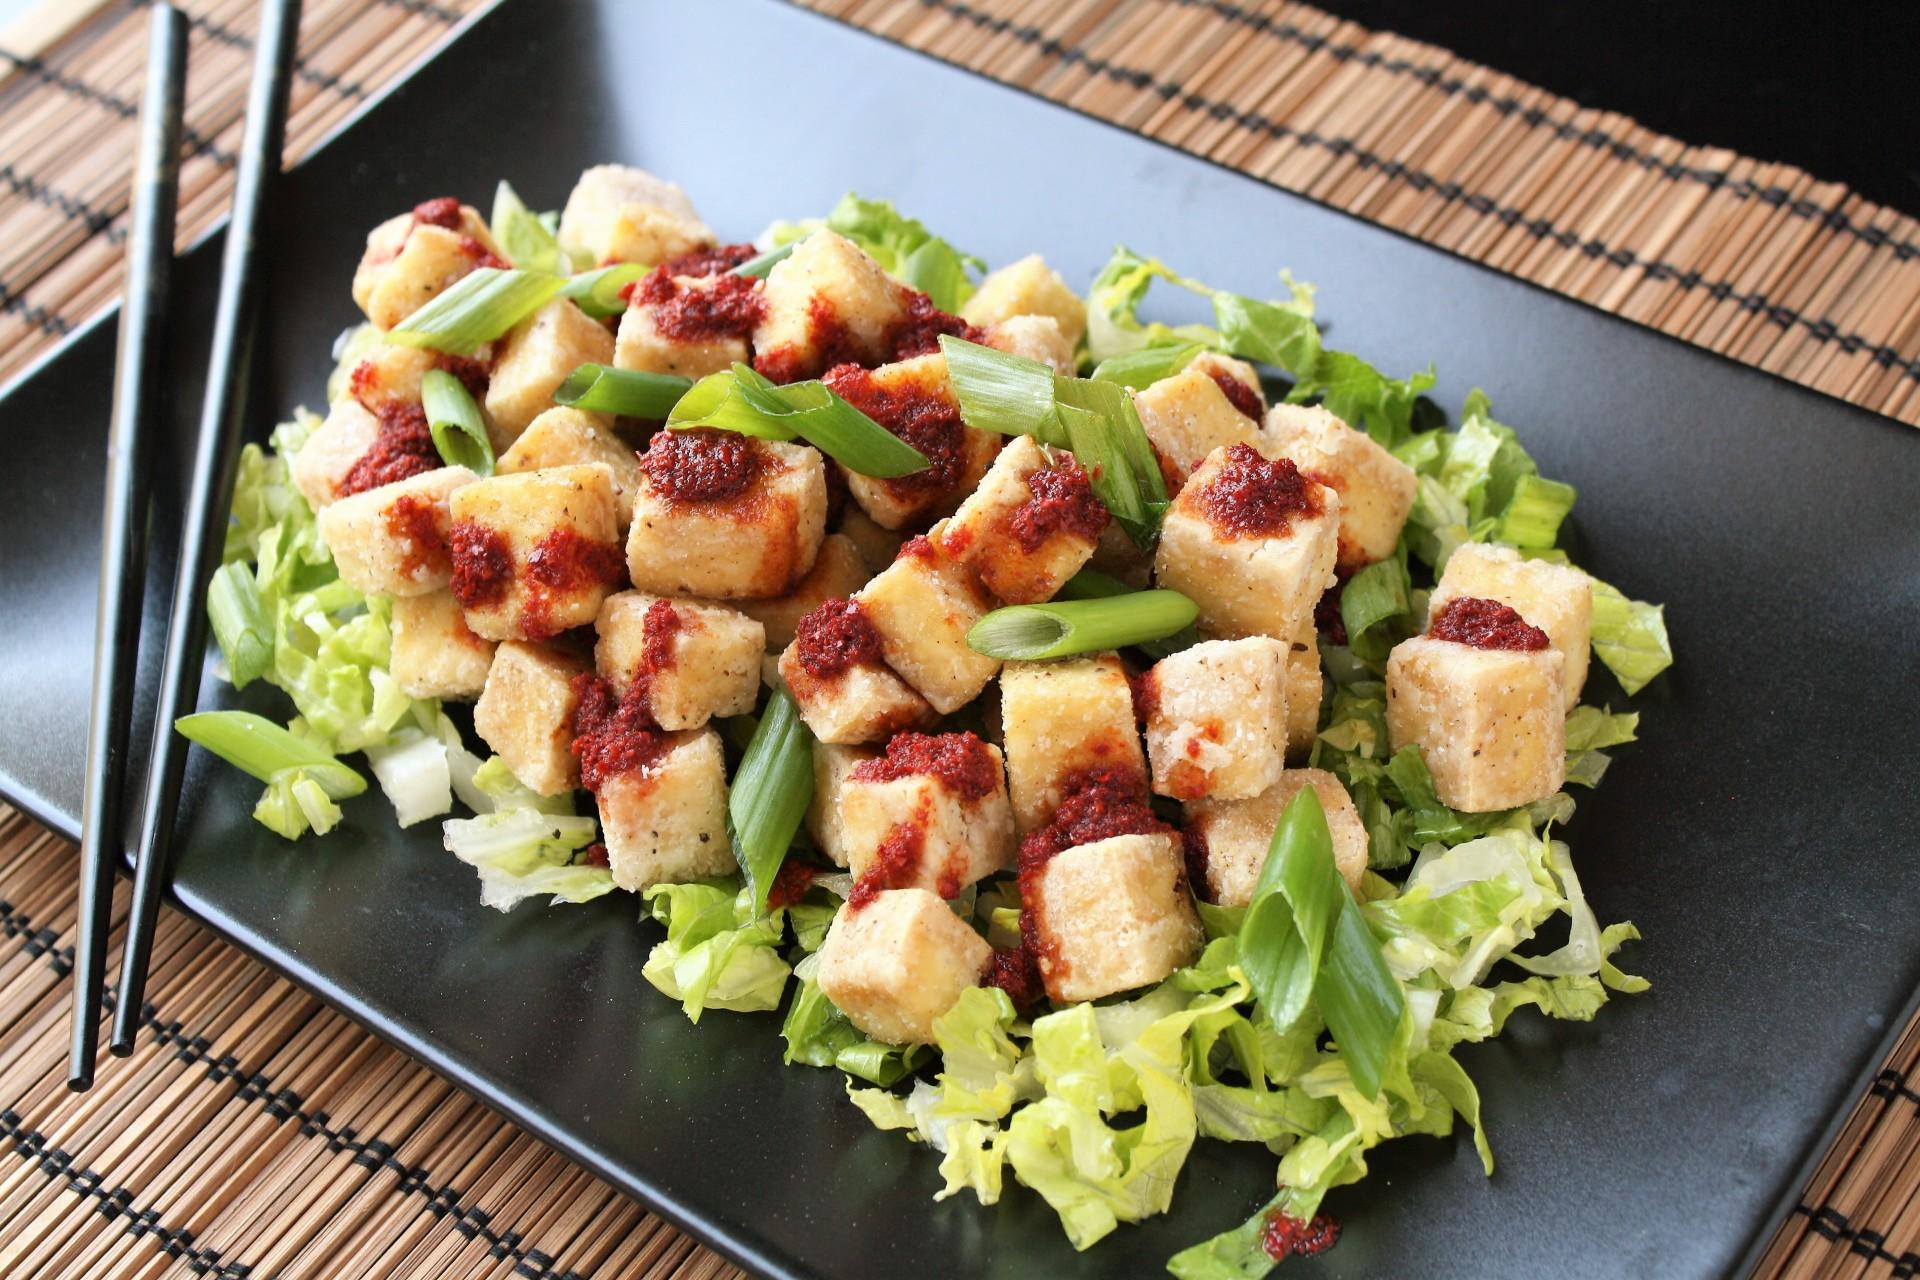 Crispy Salted Tofu with Spicy Pepper Sauce (aka: CRISPY SPICY TOFU OF AWESOMENESS)